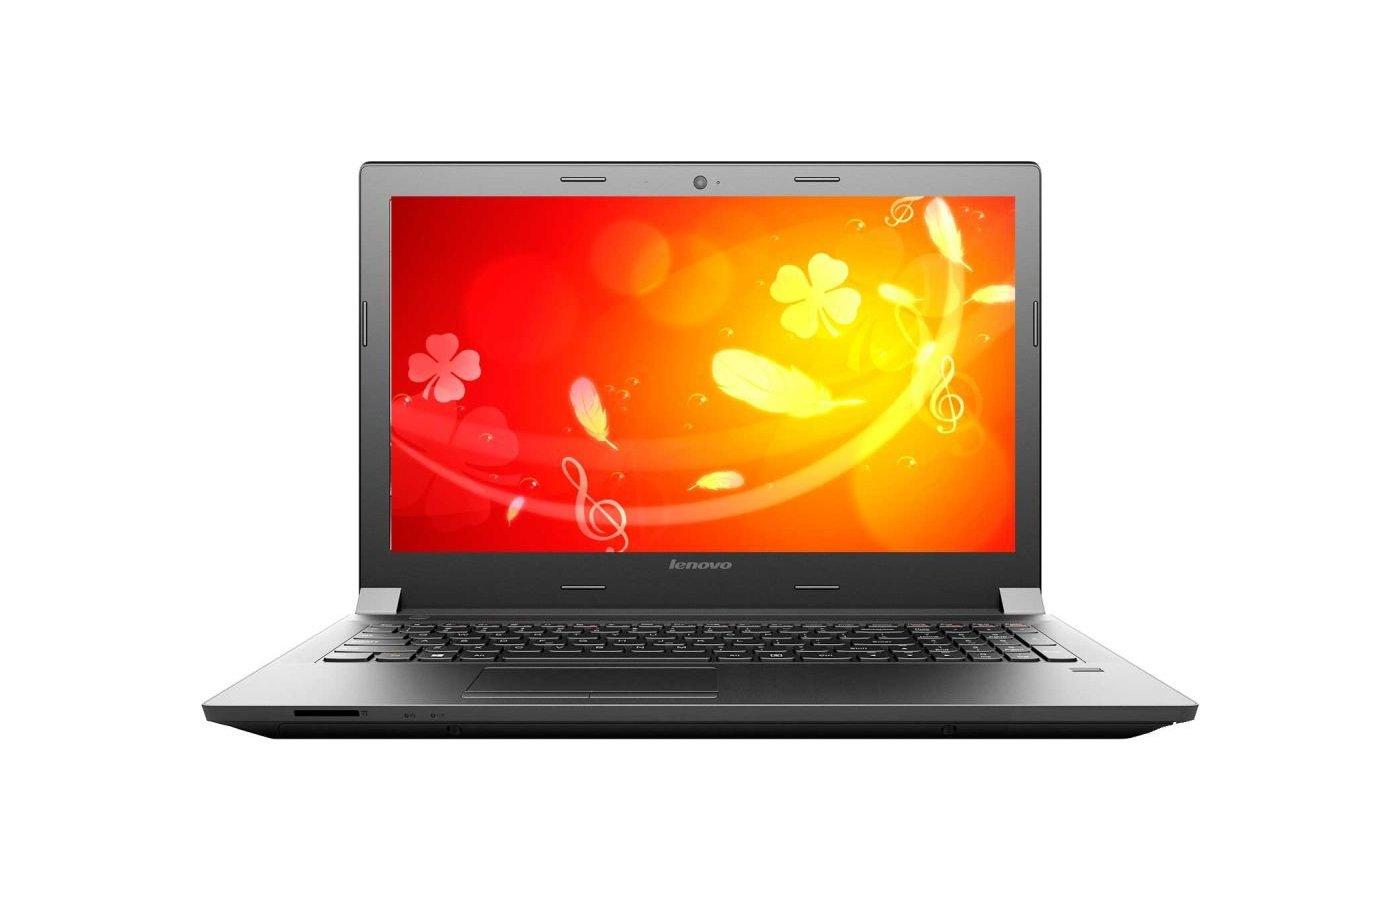 Ноутбук Lenovo IdeaPad B5045 /59443385/ AMD E1 6010/2Gb/250Gb/15.6/WiFi/BT/Win8